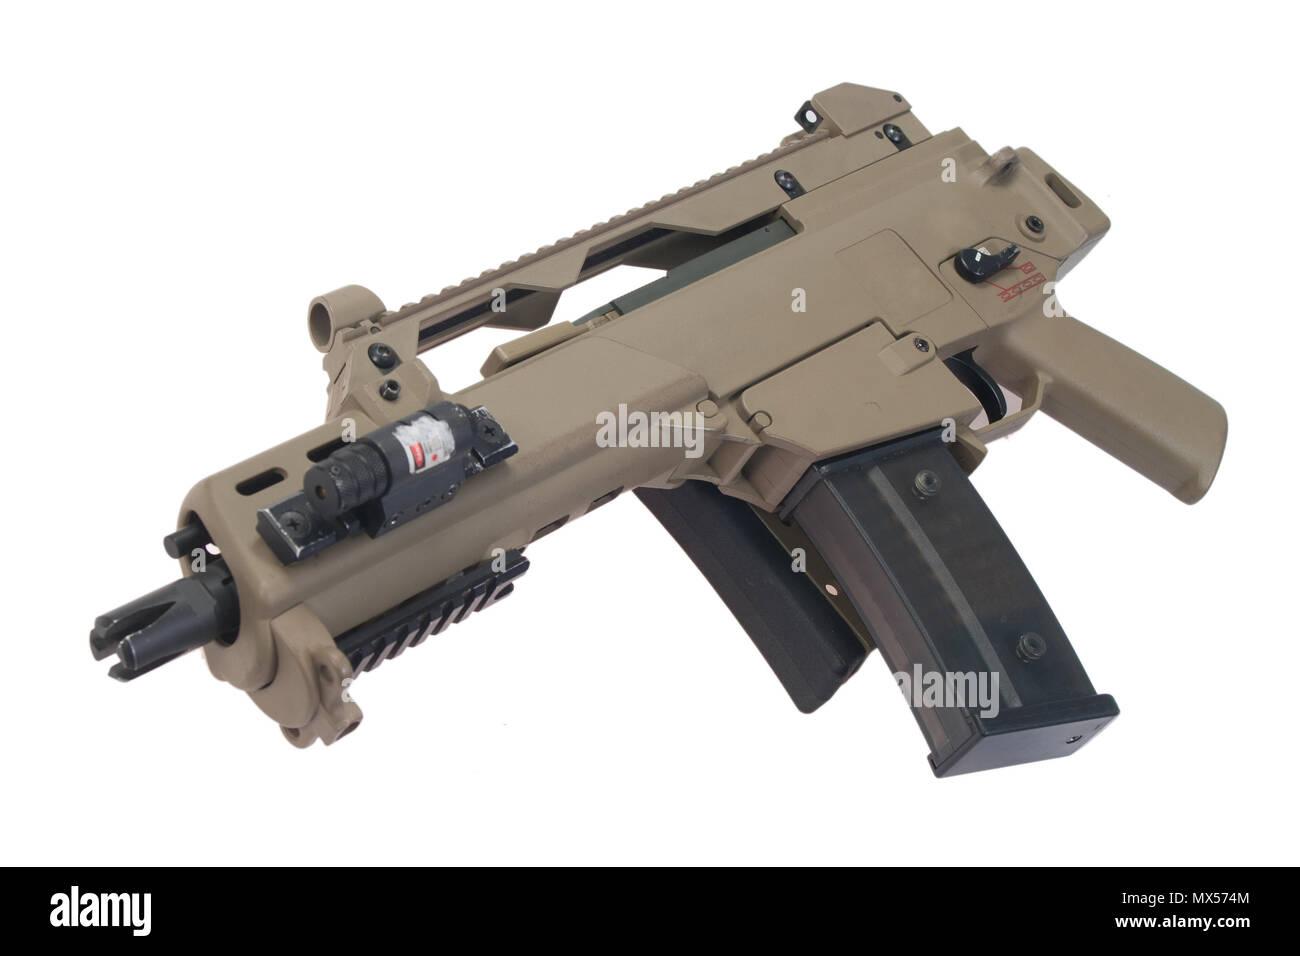 German army assault rifle G36. - Stock Image